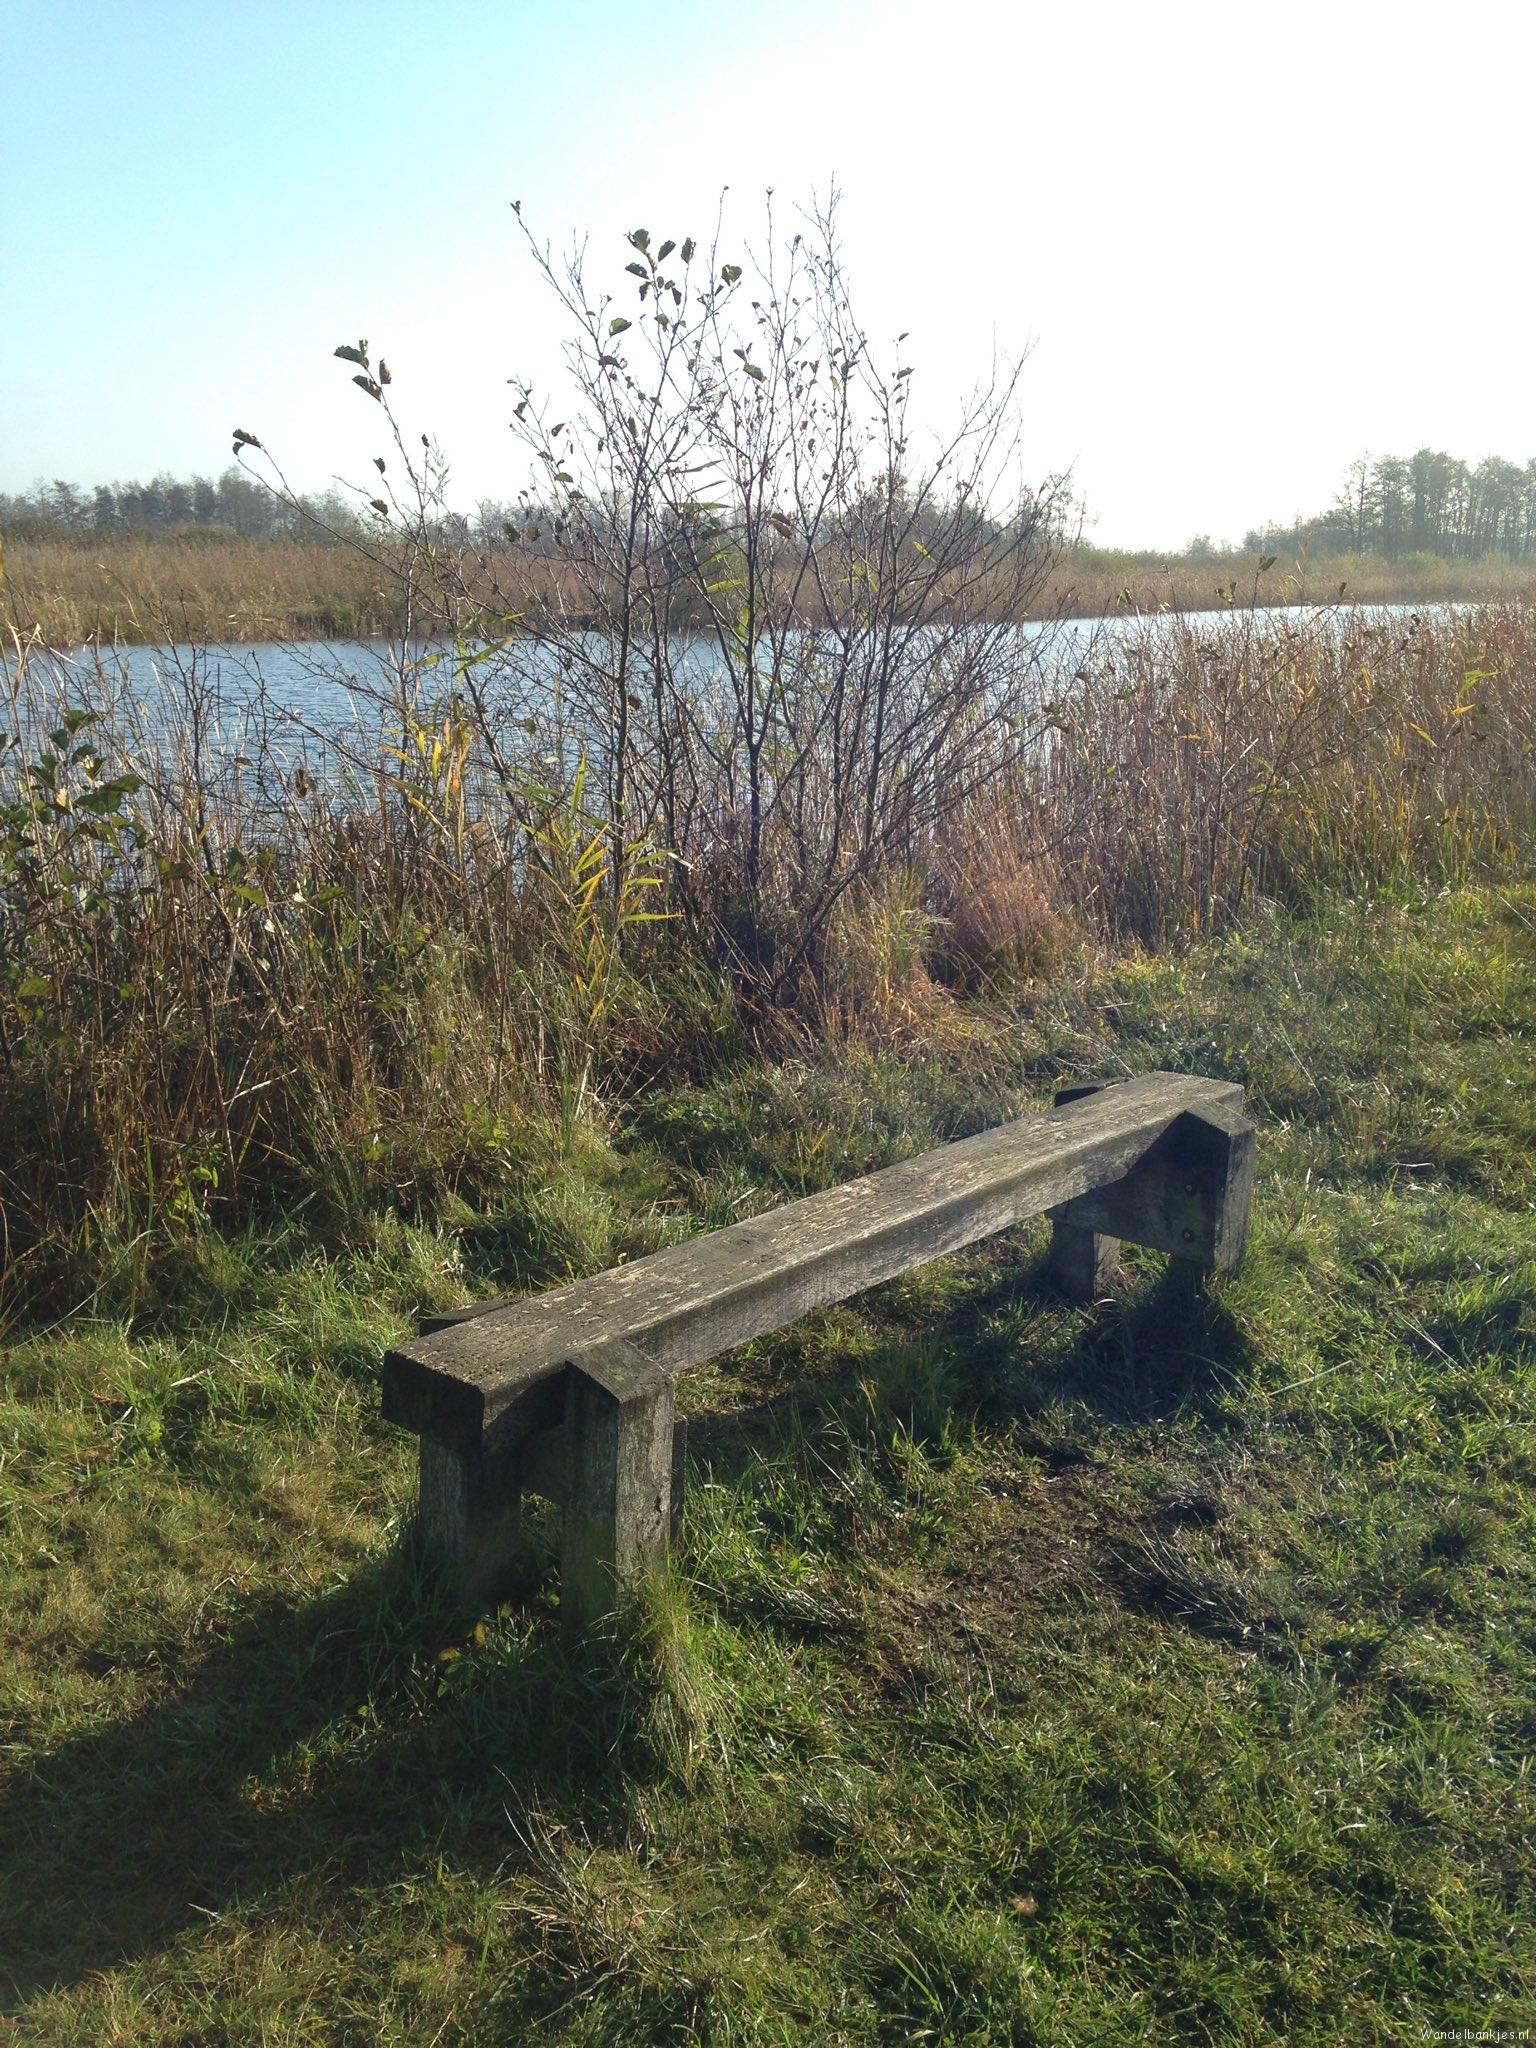 rt-martenvdmolen-walk-bench-in-the-wieden-at-wanneperveen-walkways-httpst-cooql3iyvcti